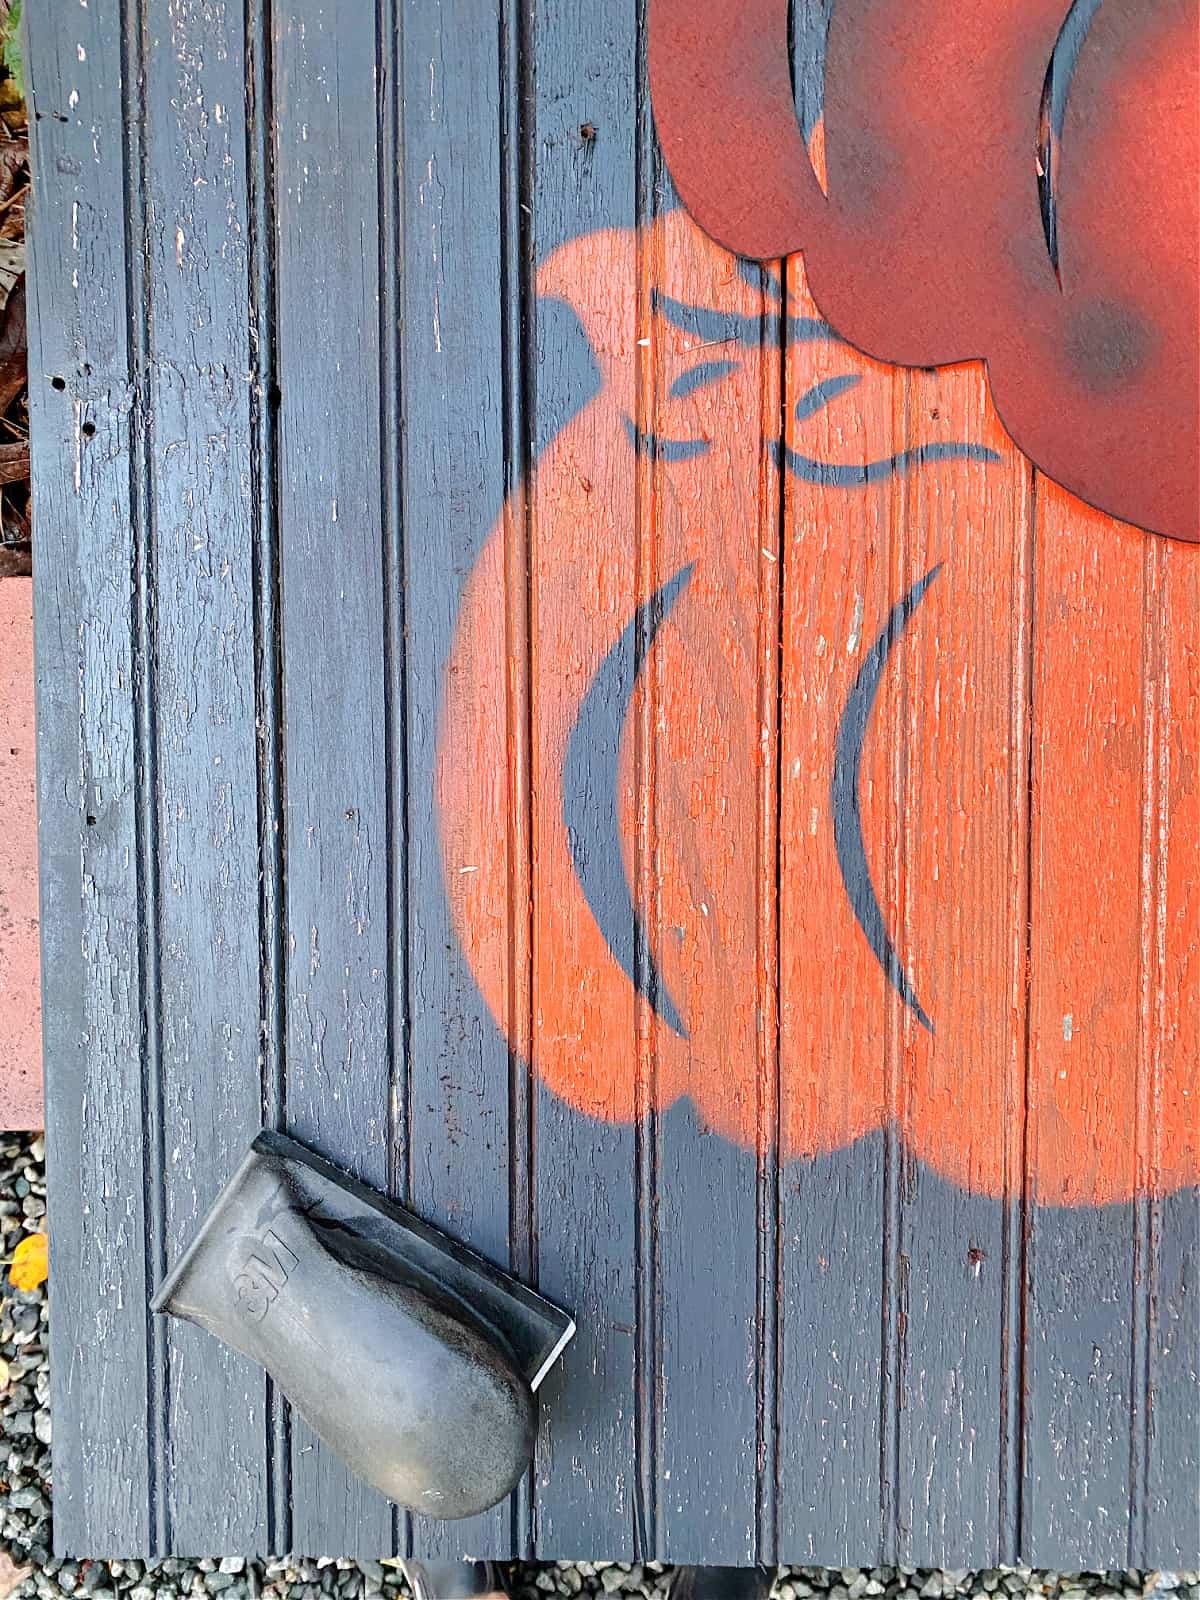 sanding block on pumpkin wood sign